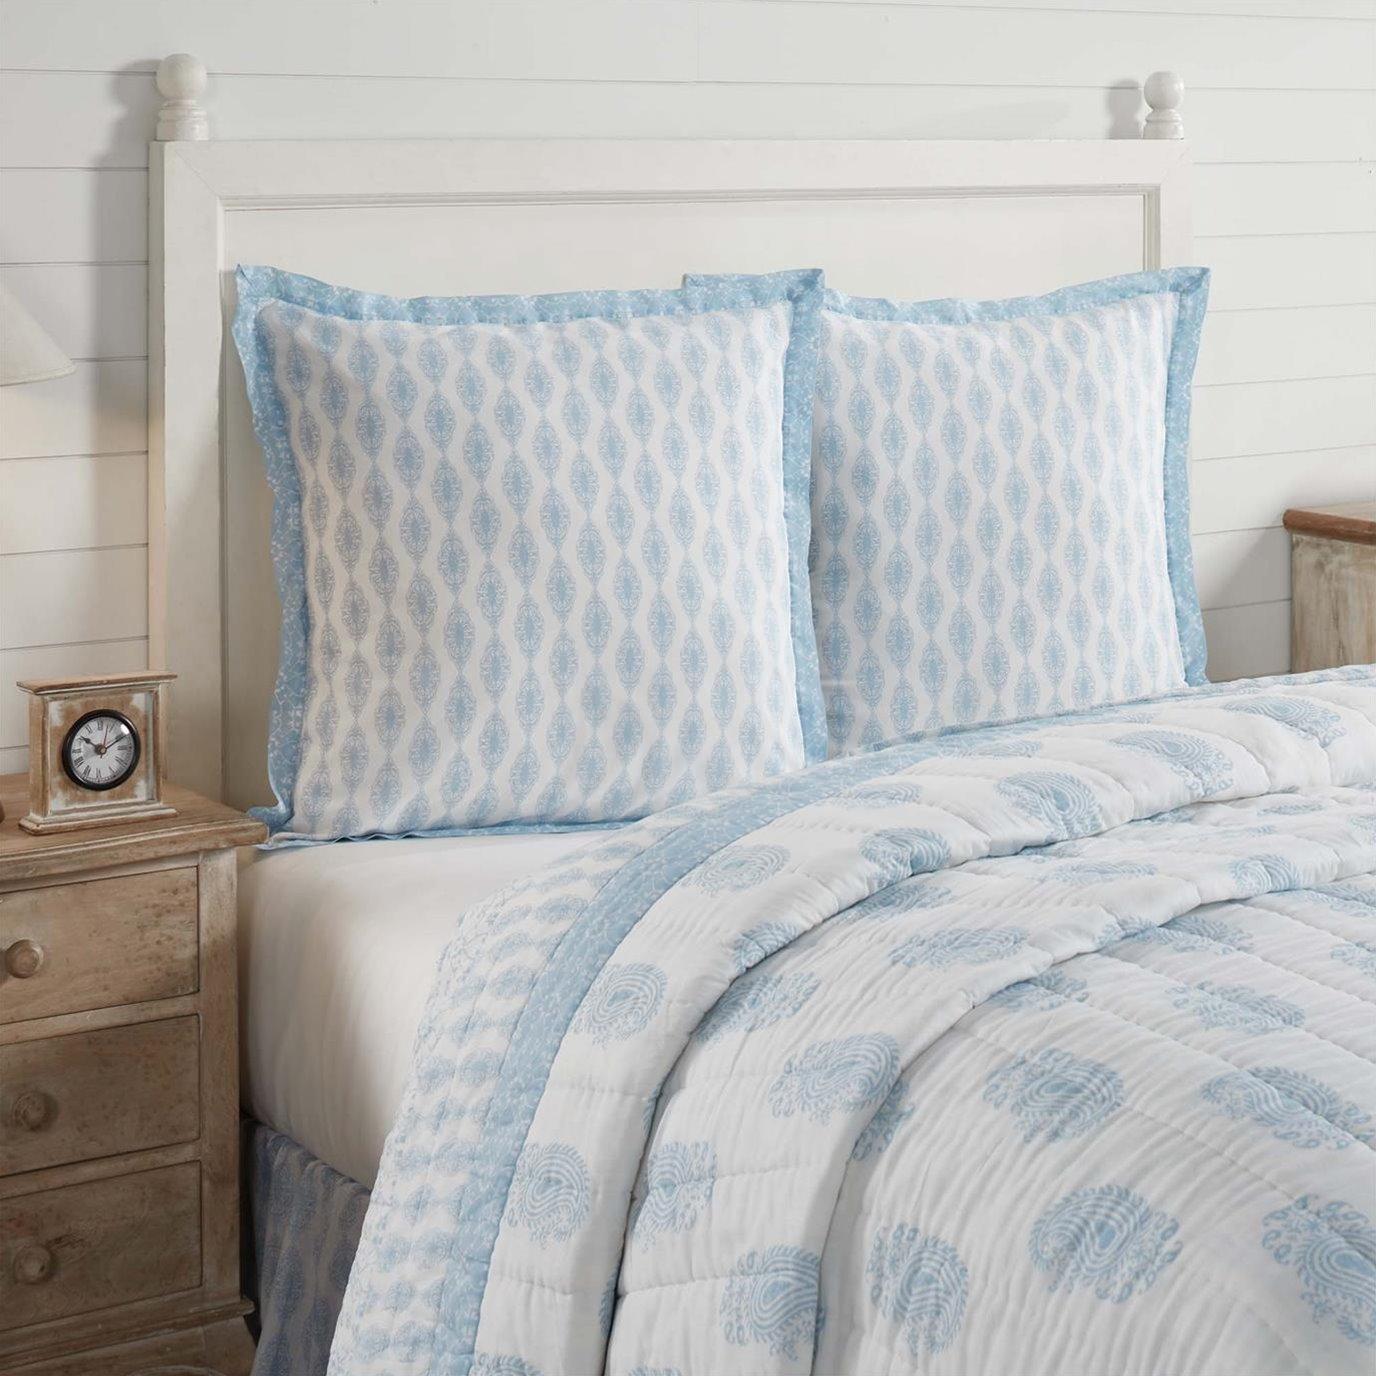 Avani Blue Fabric Euro Sham 26x26